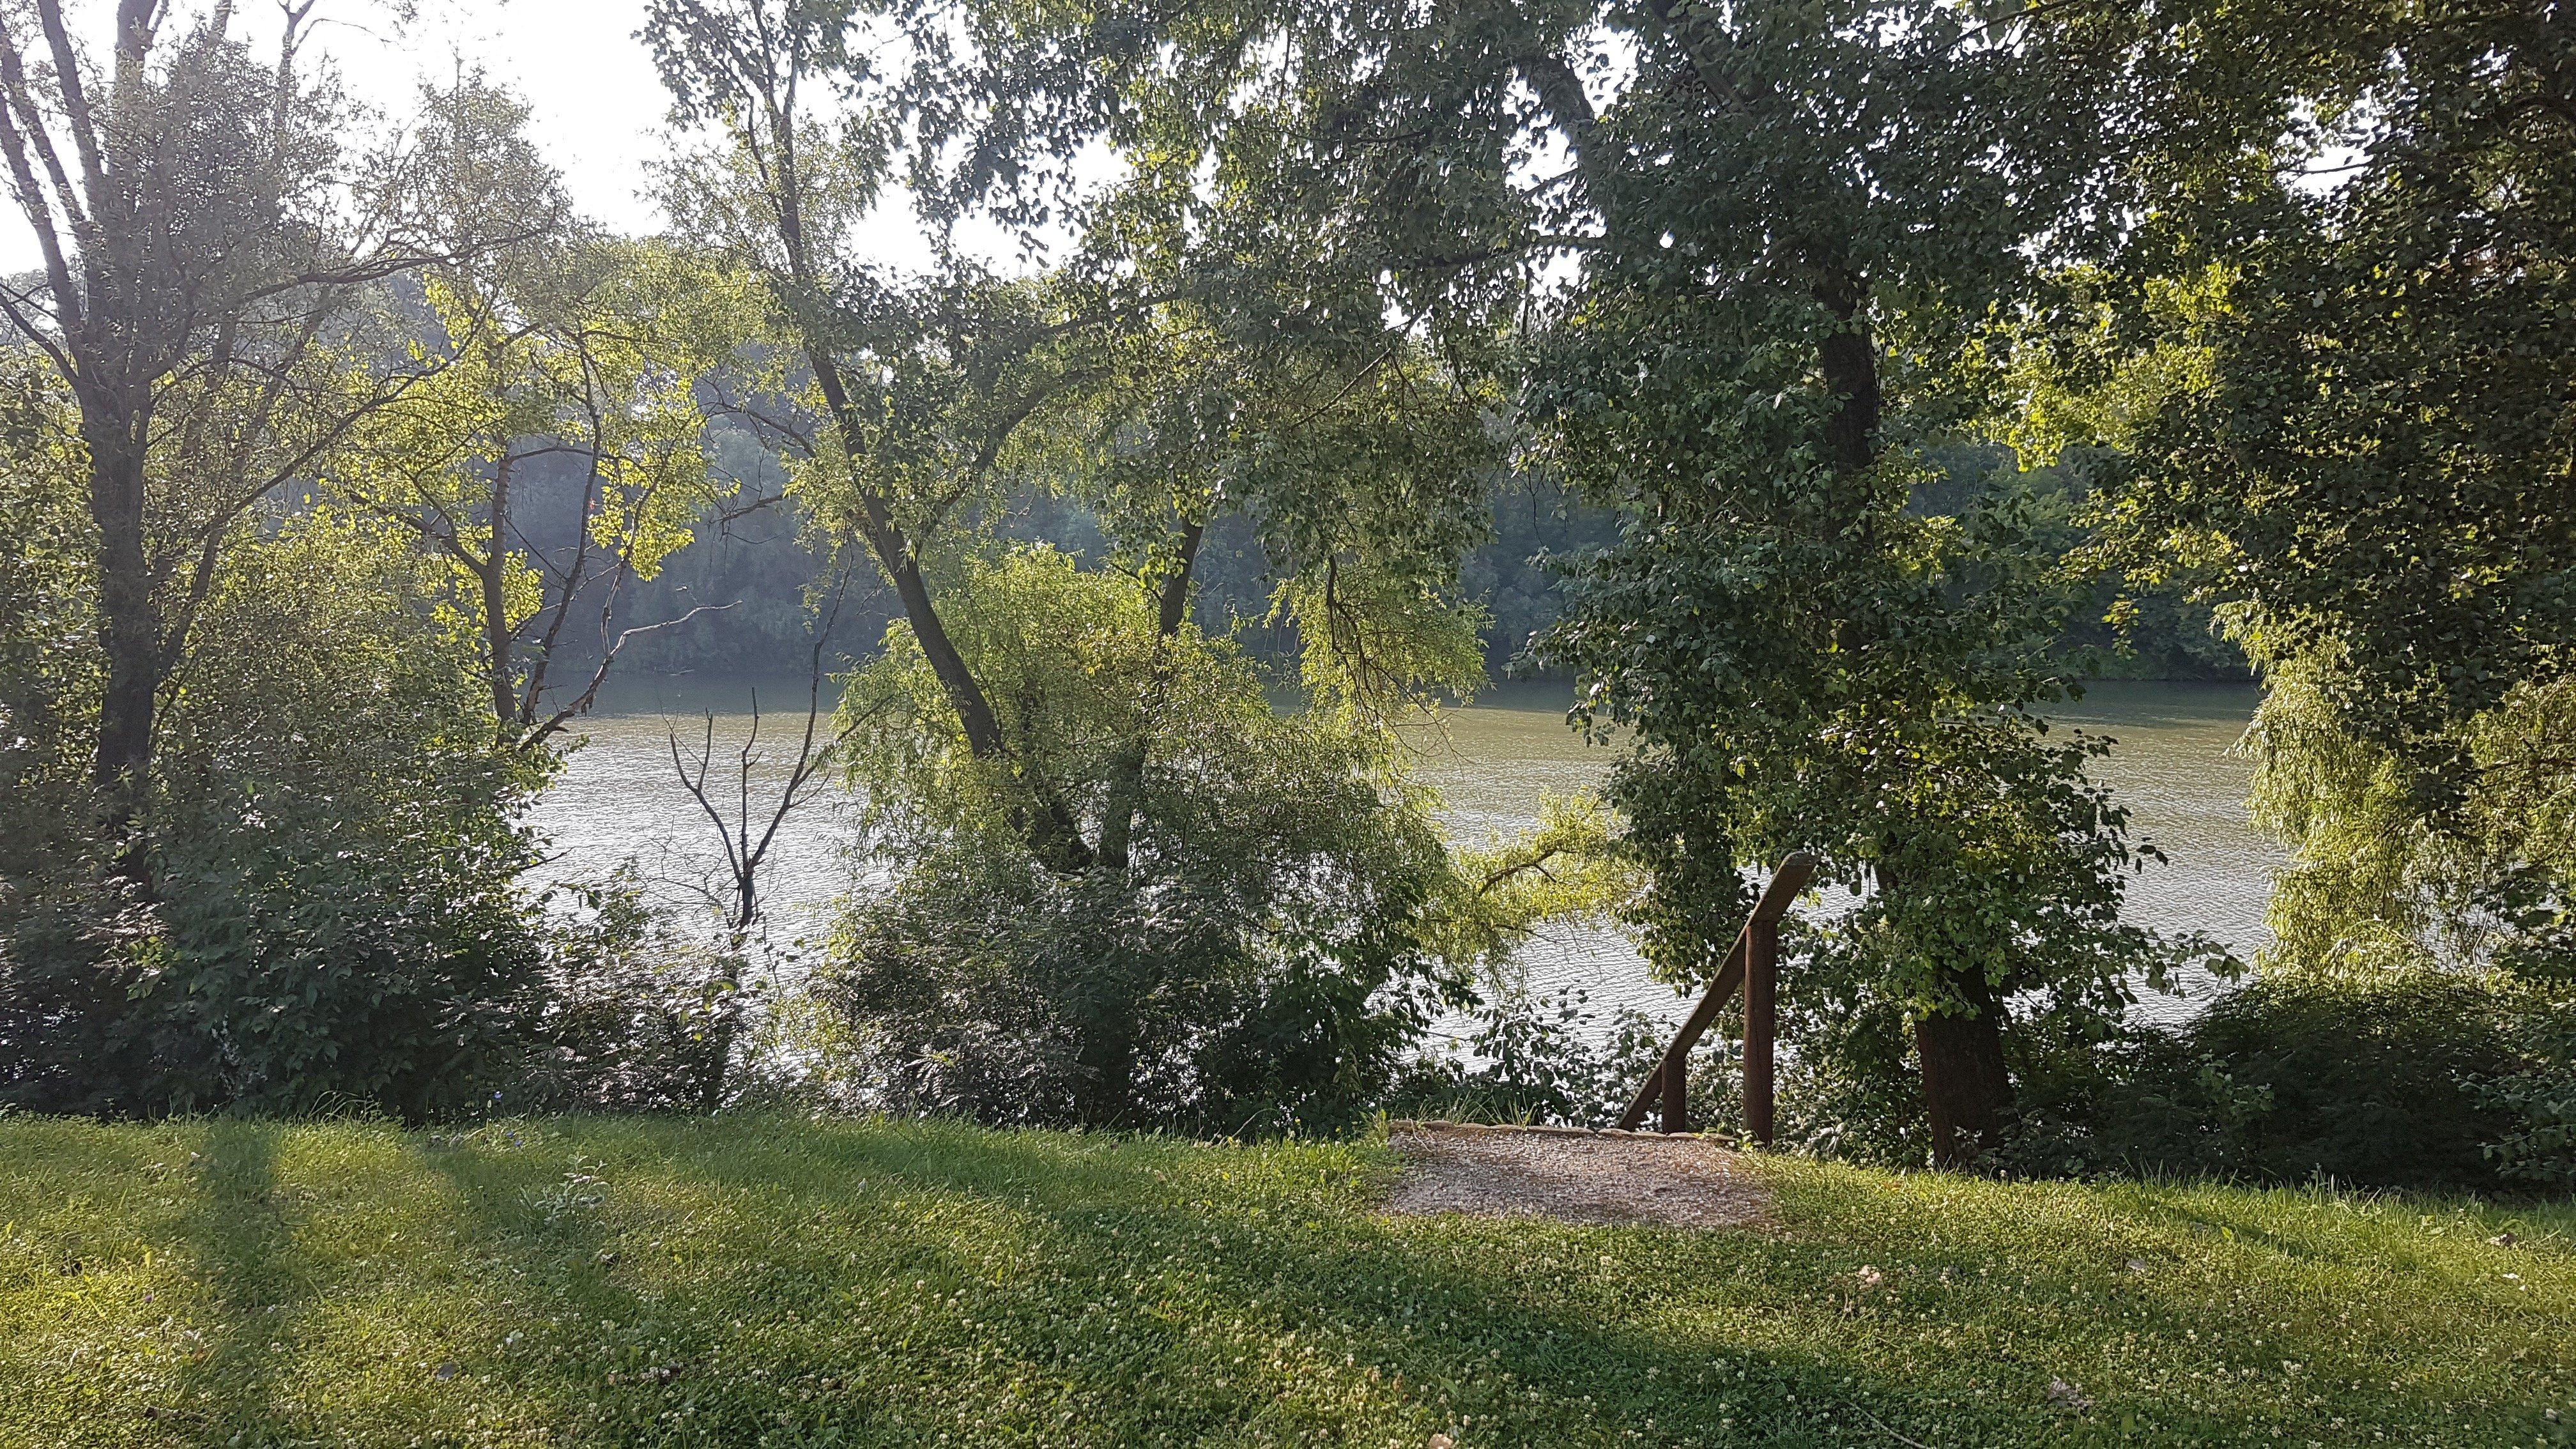 Tisza river behind the trees - itstartswithacoffee.com #Tisza #Tisza-river